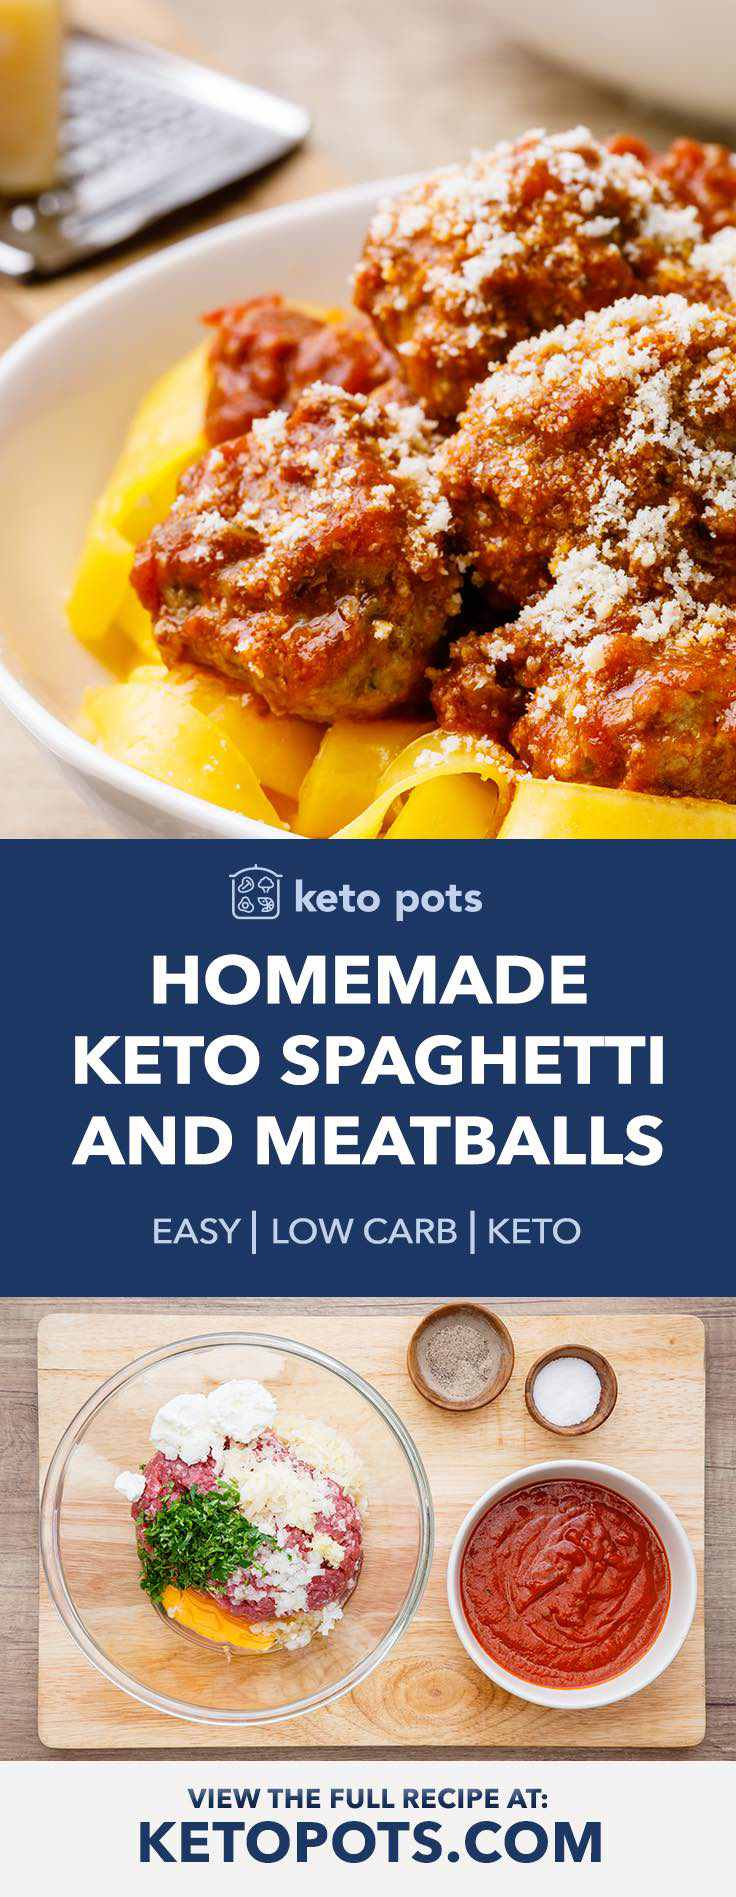 The best homemade keto spaghetti and meatballs.